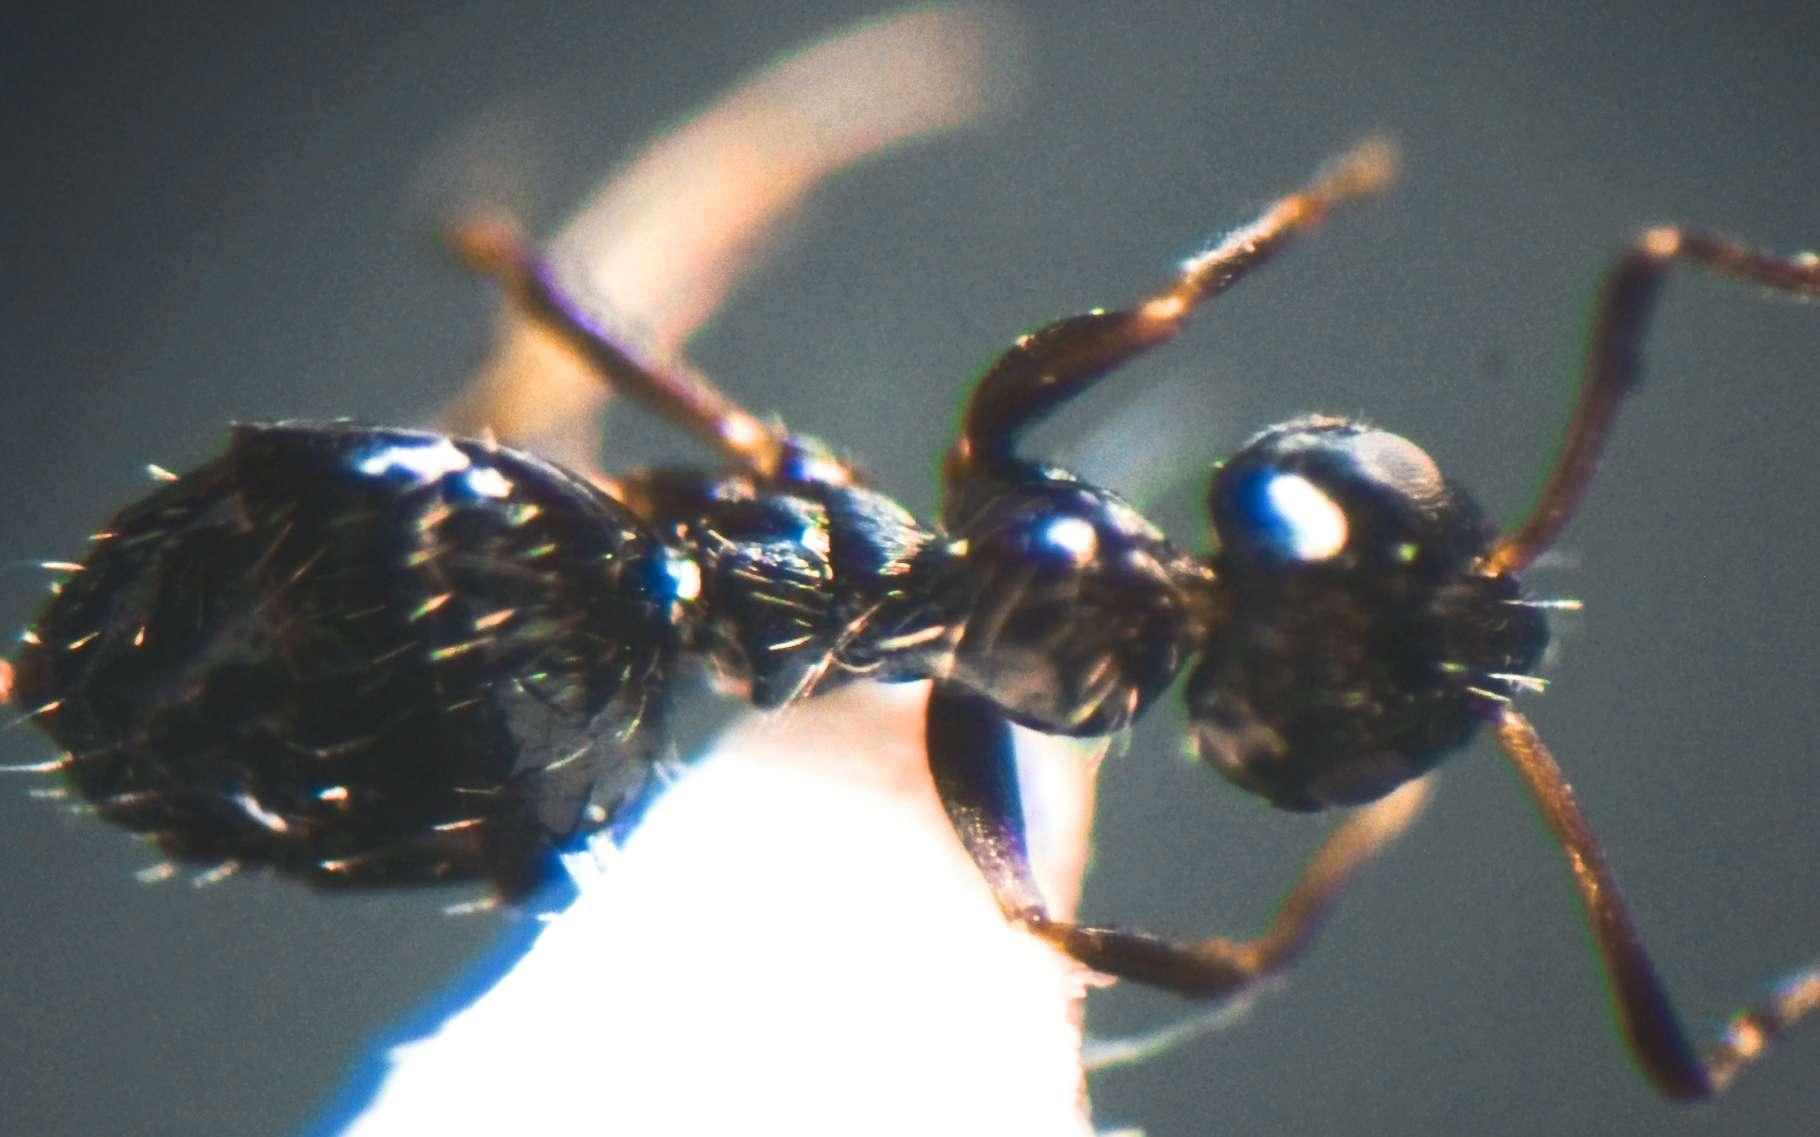 Une fourmi de l'espèce Lepisiota canescens. © Ants of Africa